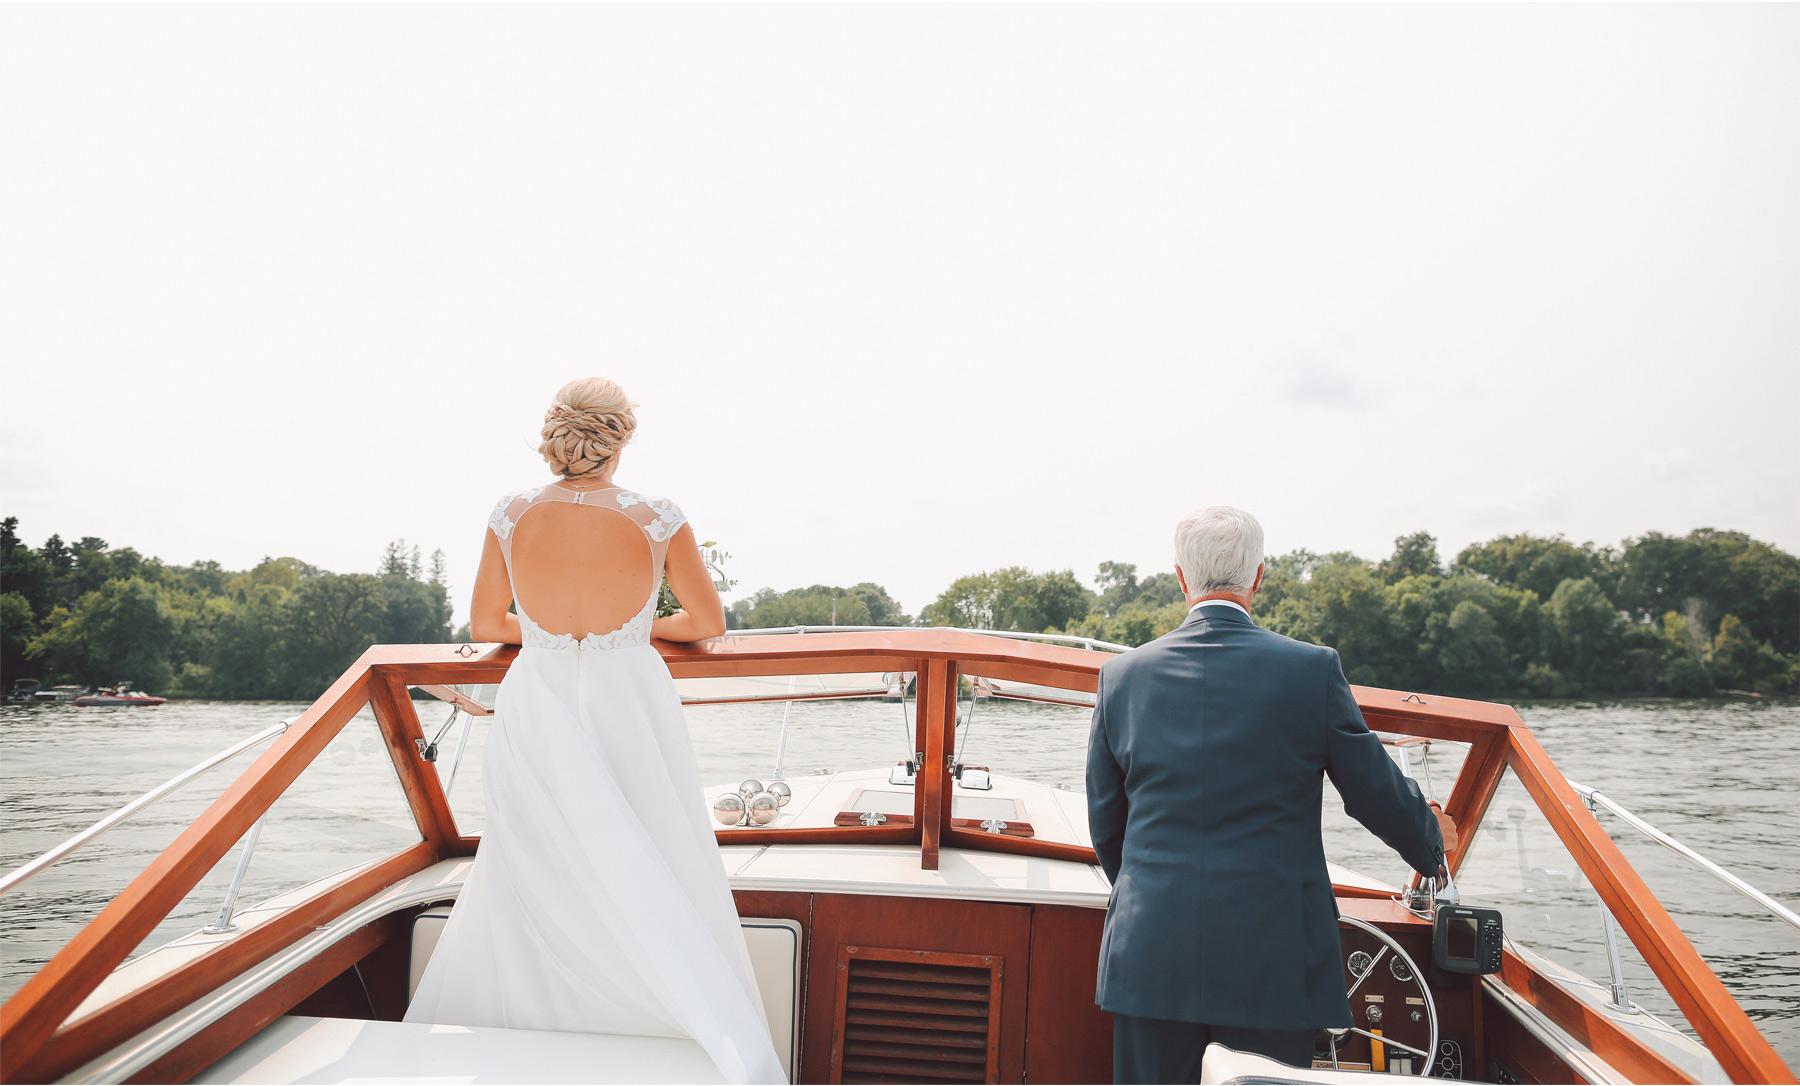 04-Minnetonka-Minnesota-Wedding-Photography-by-Vick-Photography-Boat-Lake-Minnetonka-First-Father-of-the-Bride-Jennifer-and-Adam.jpg